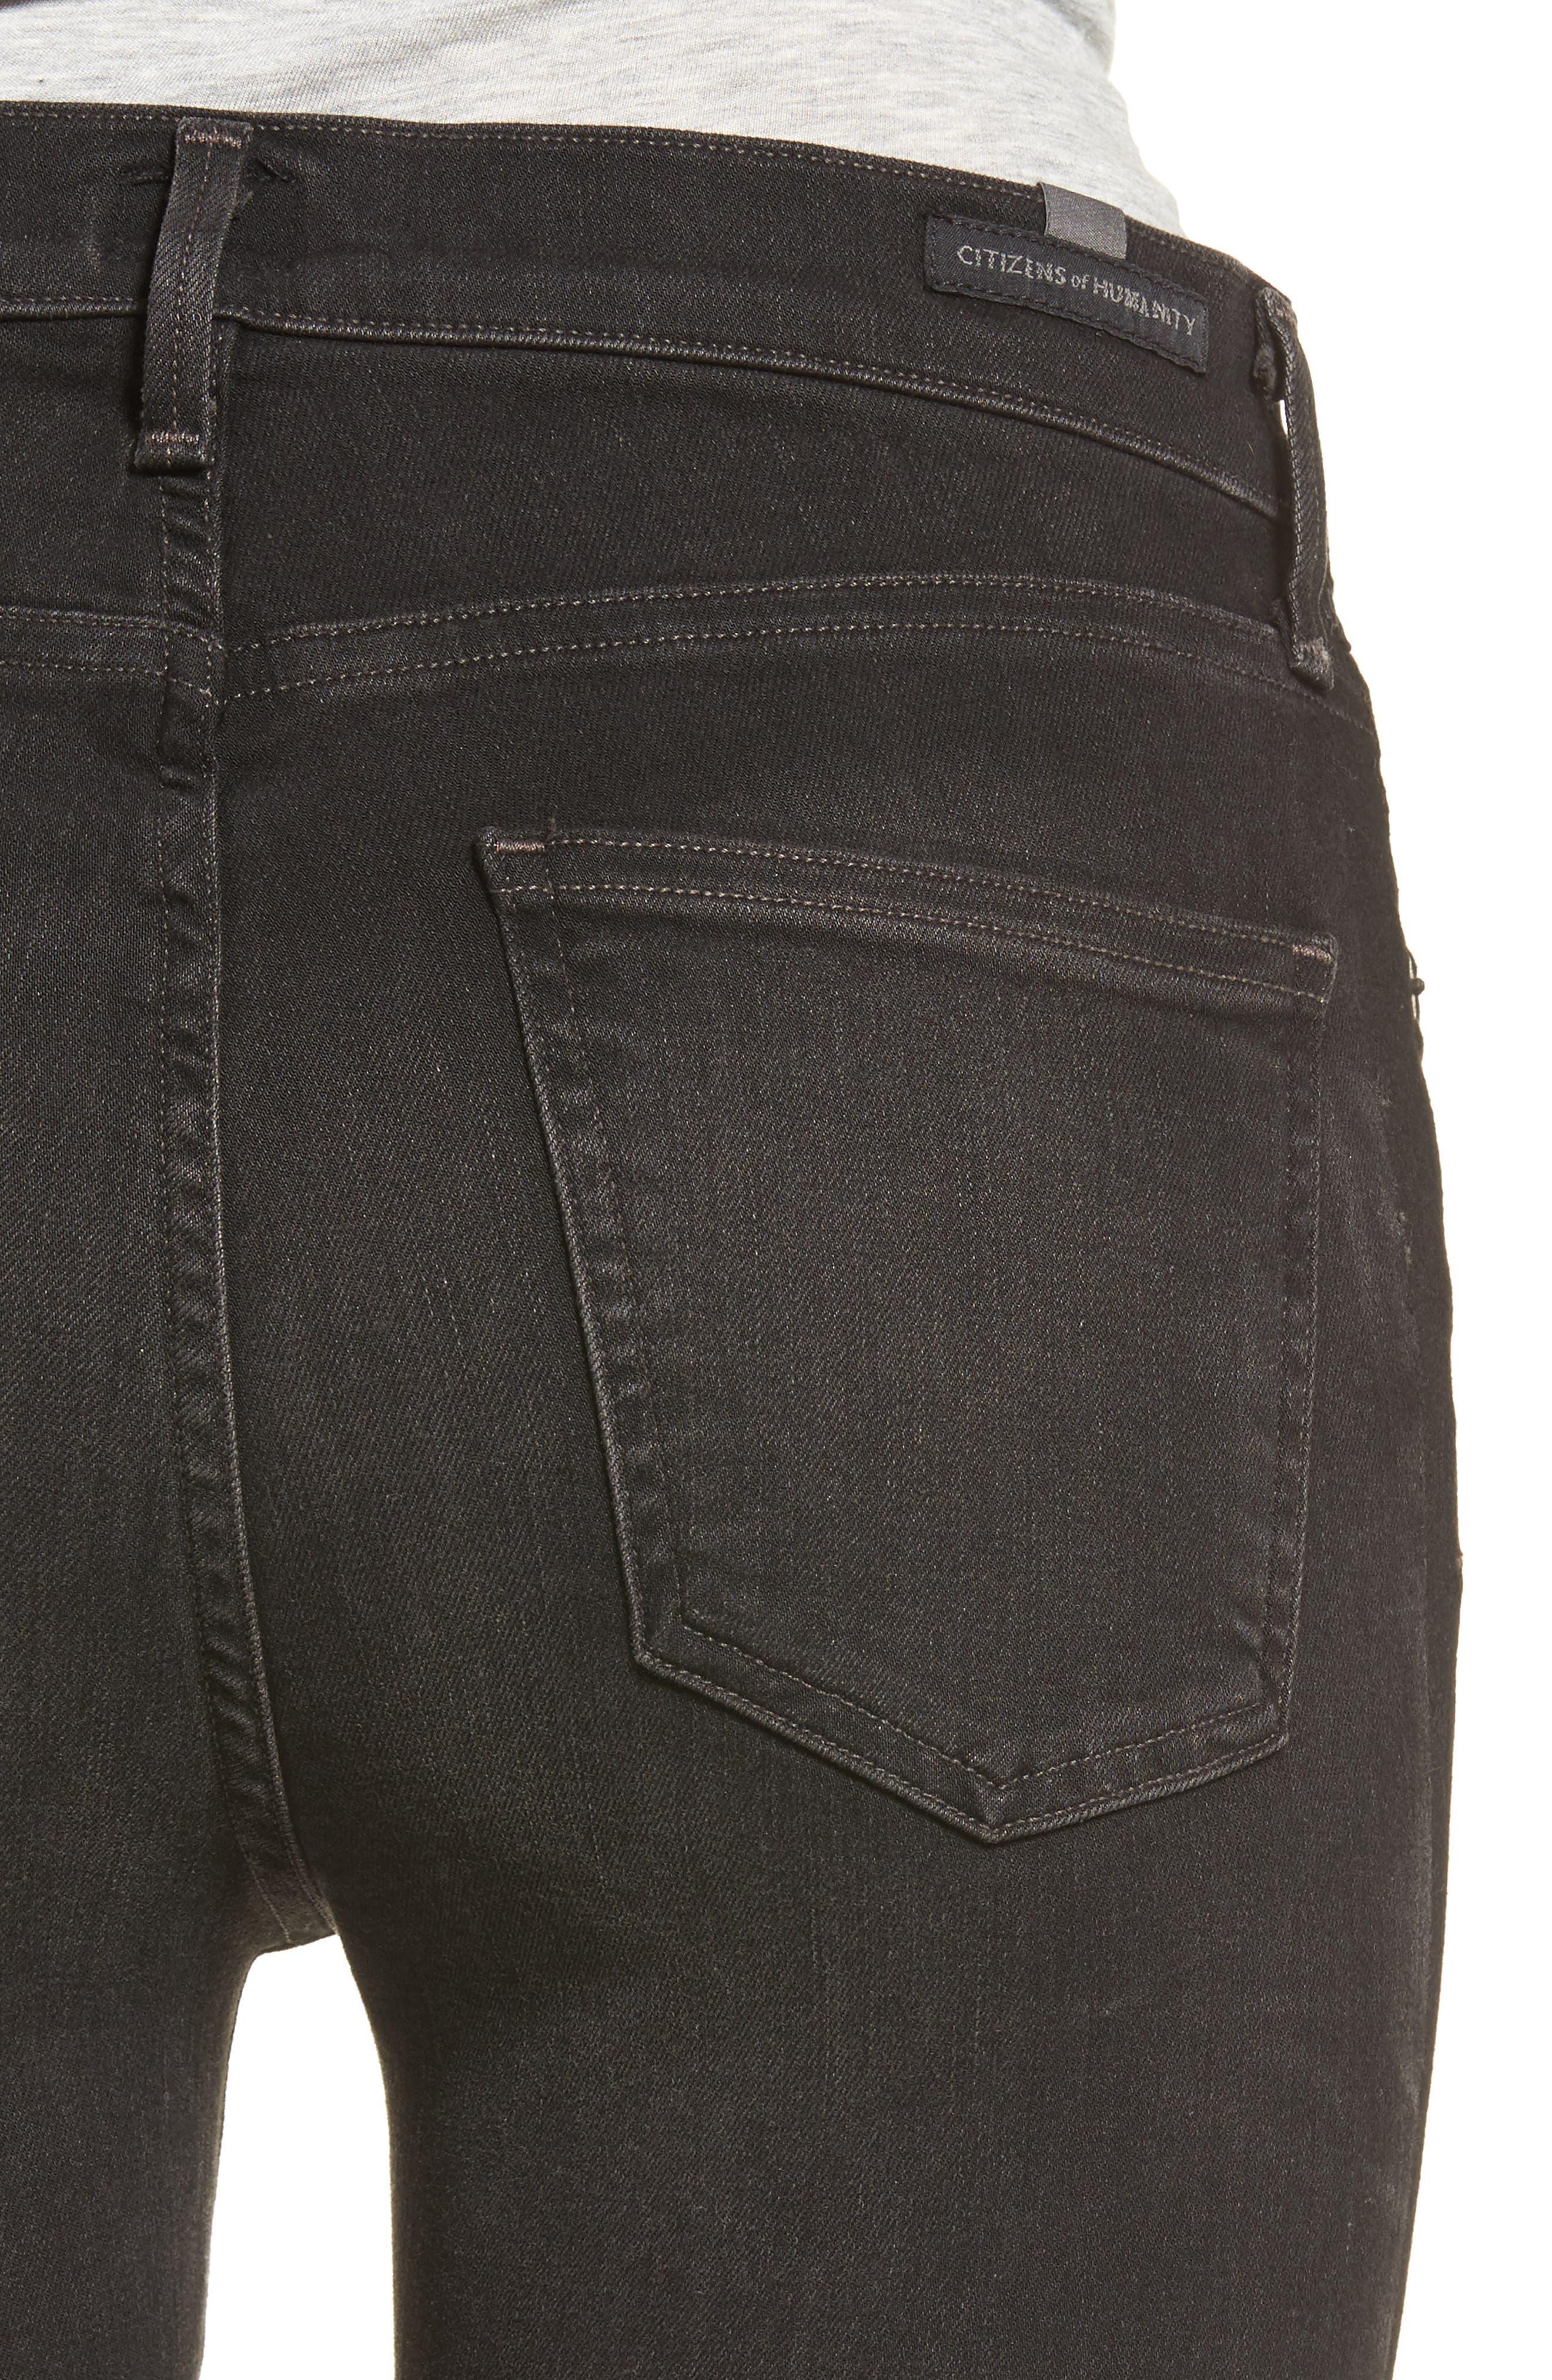 Rocket High Waist Crop Skinny Jeans,                             Alternate thumbnail 4, color,                             009